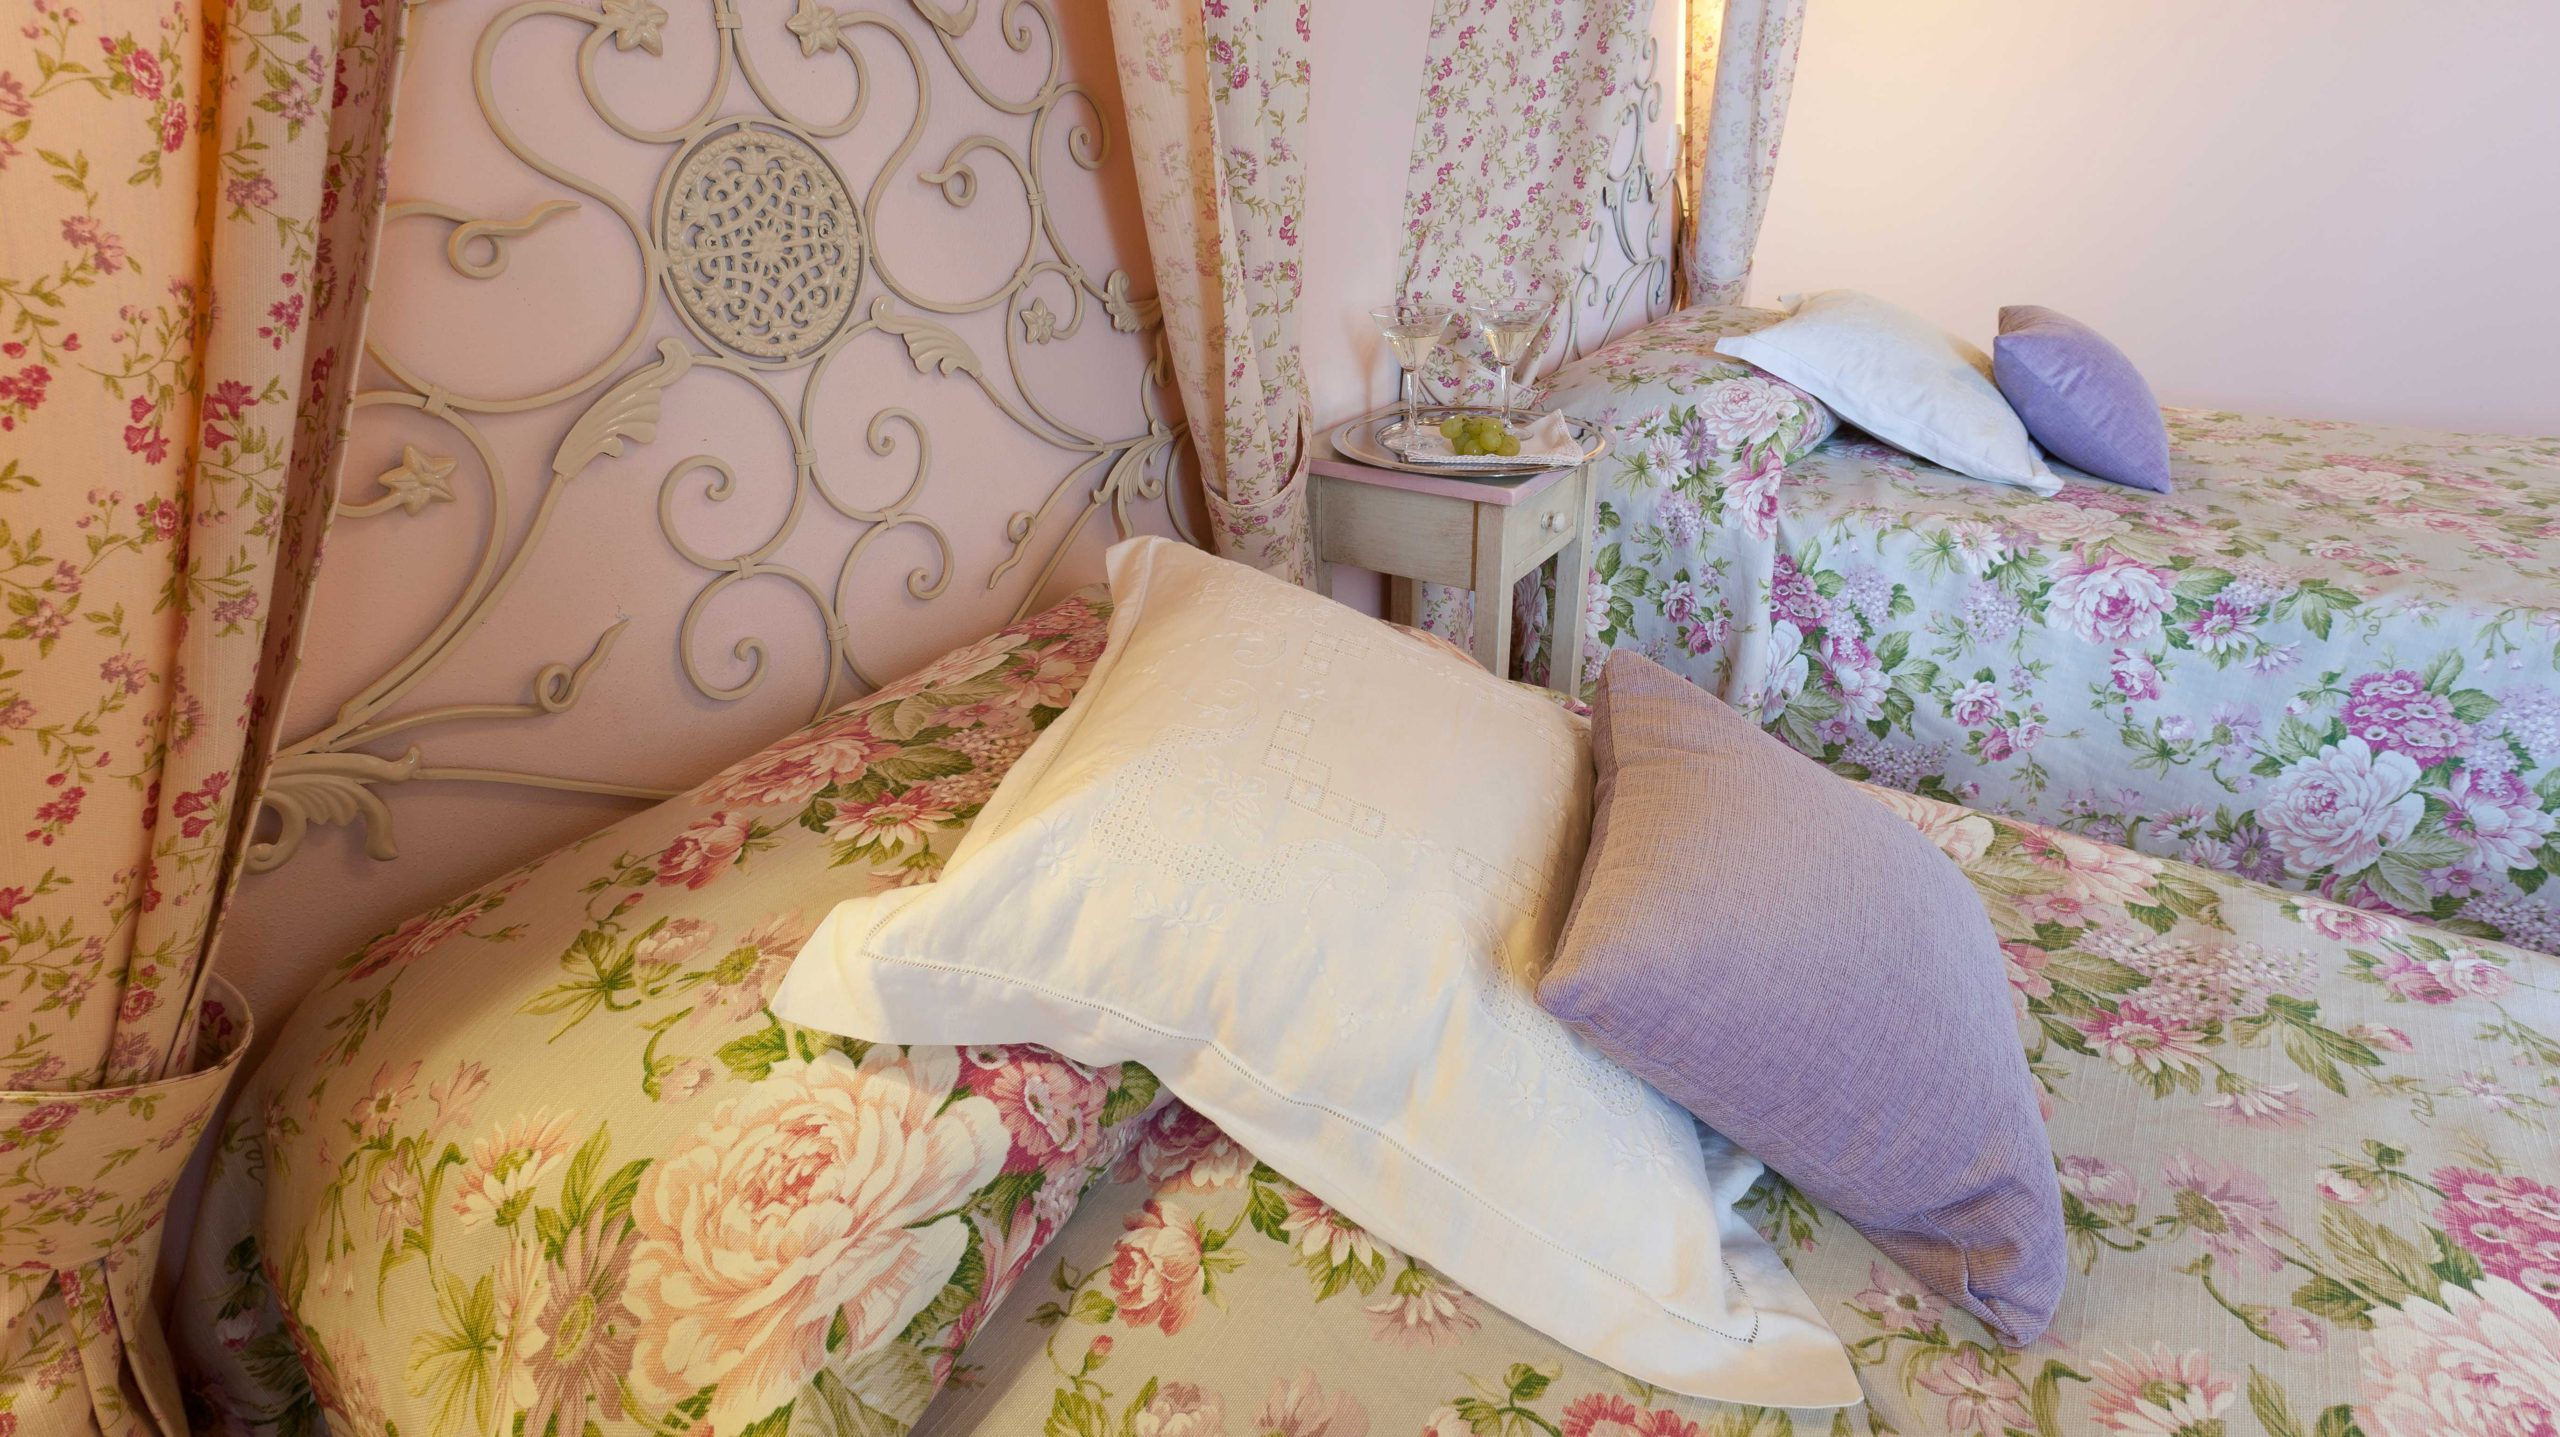 Mezzogiorno slaapkamer